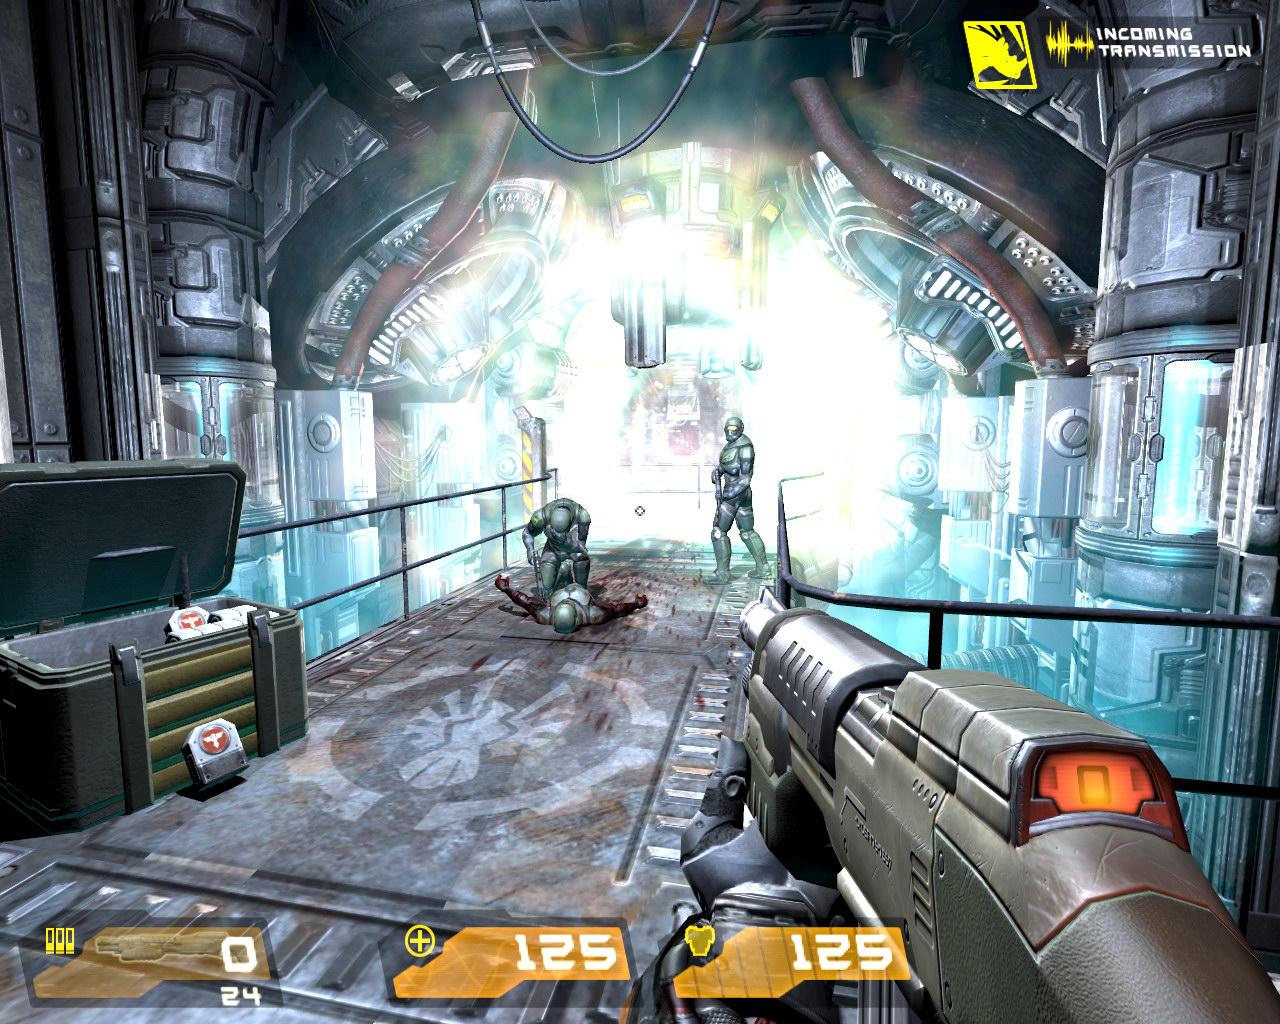 video game screen shot